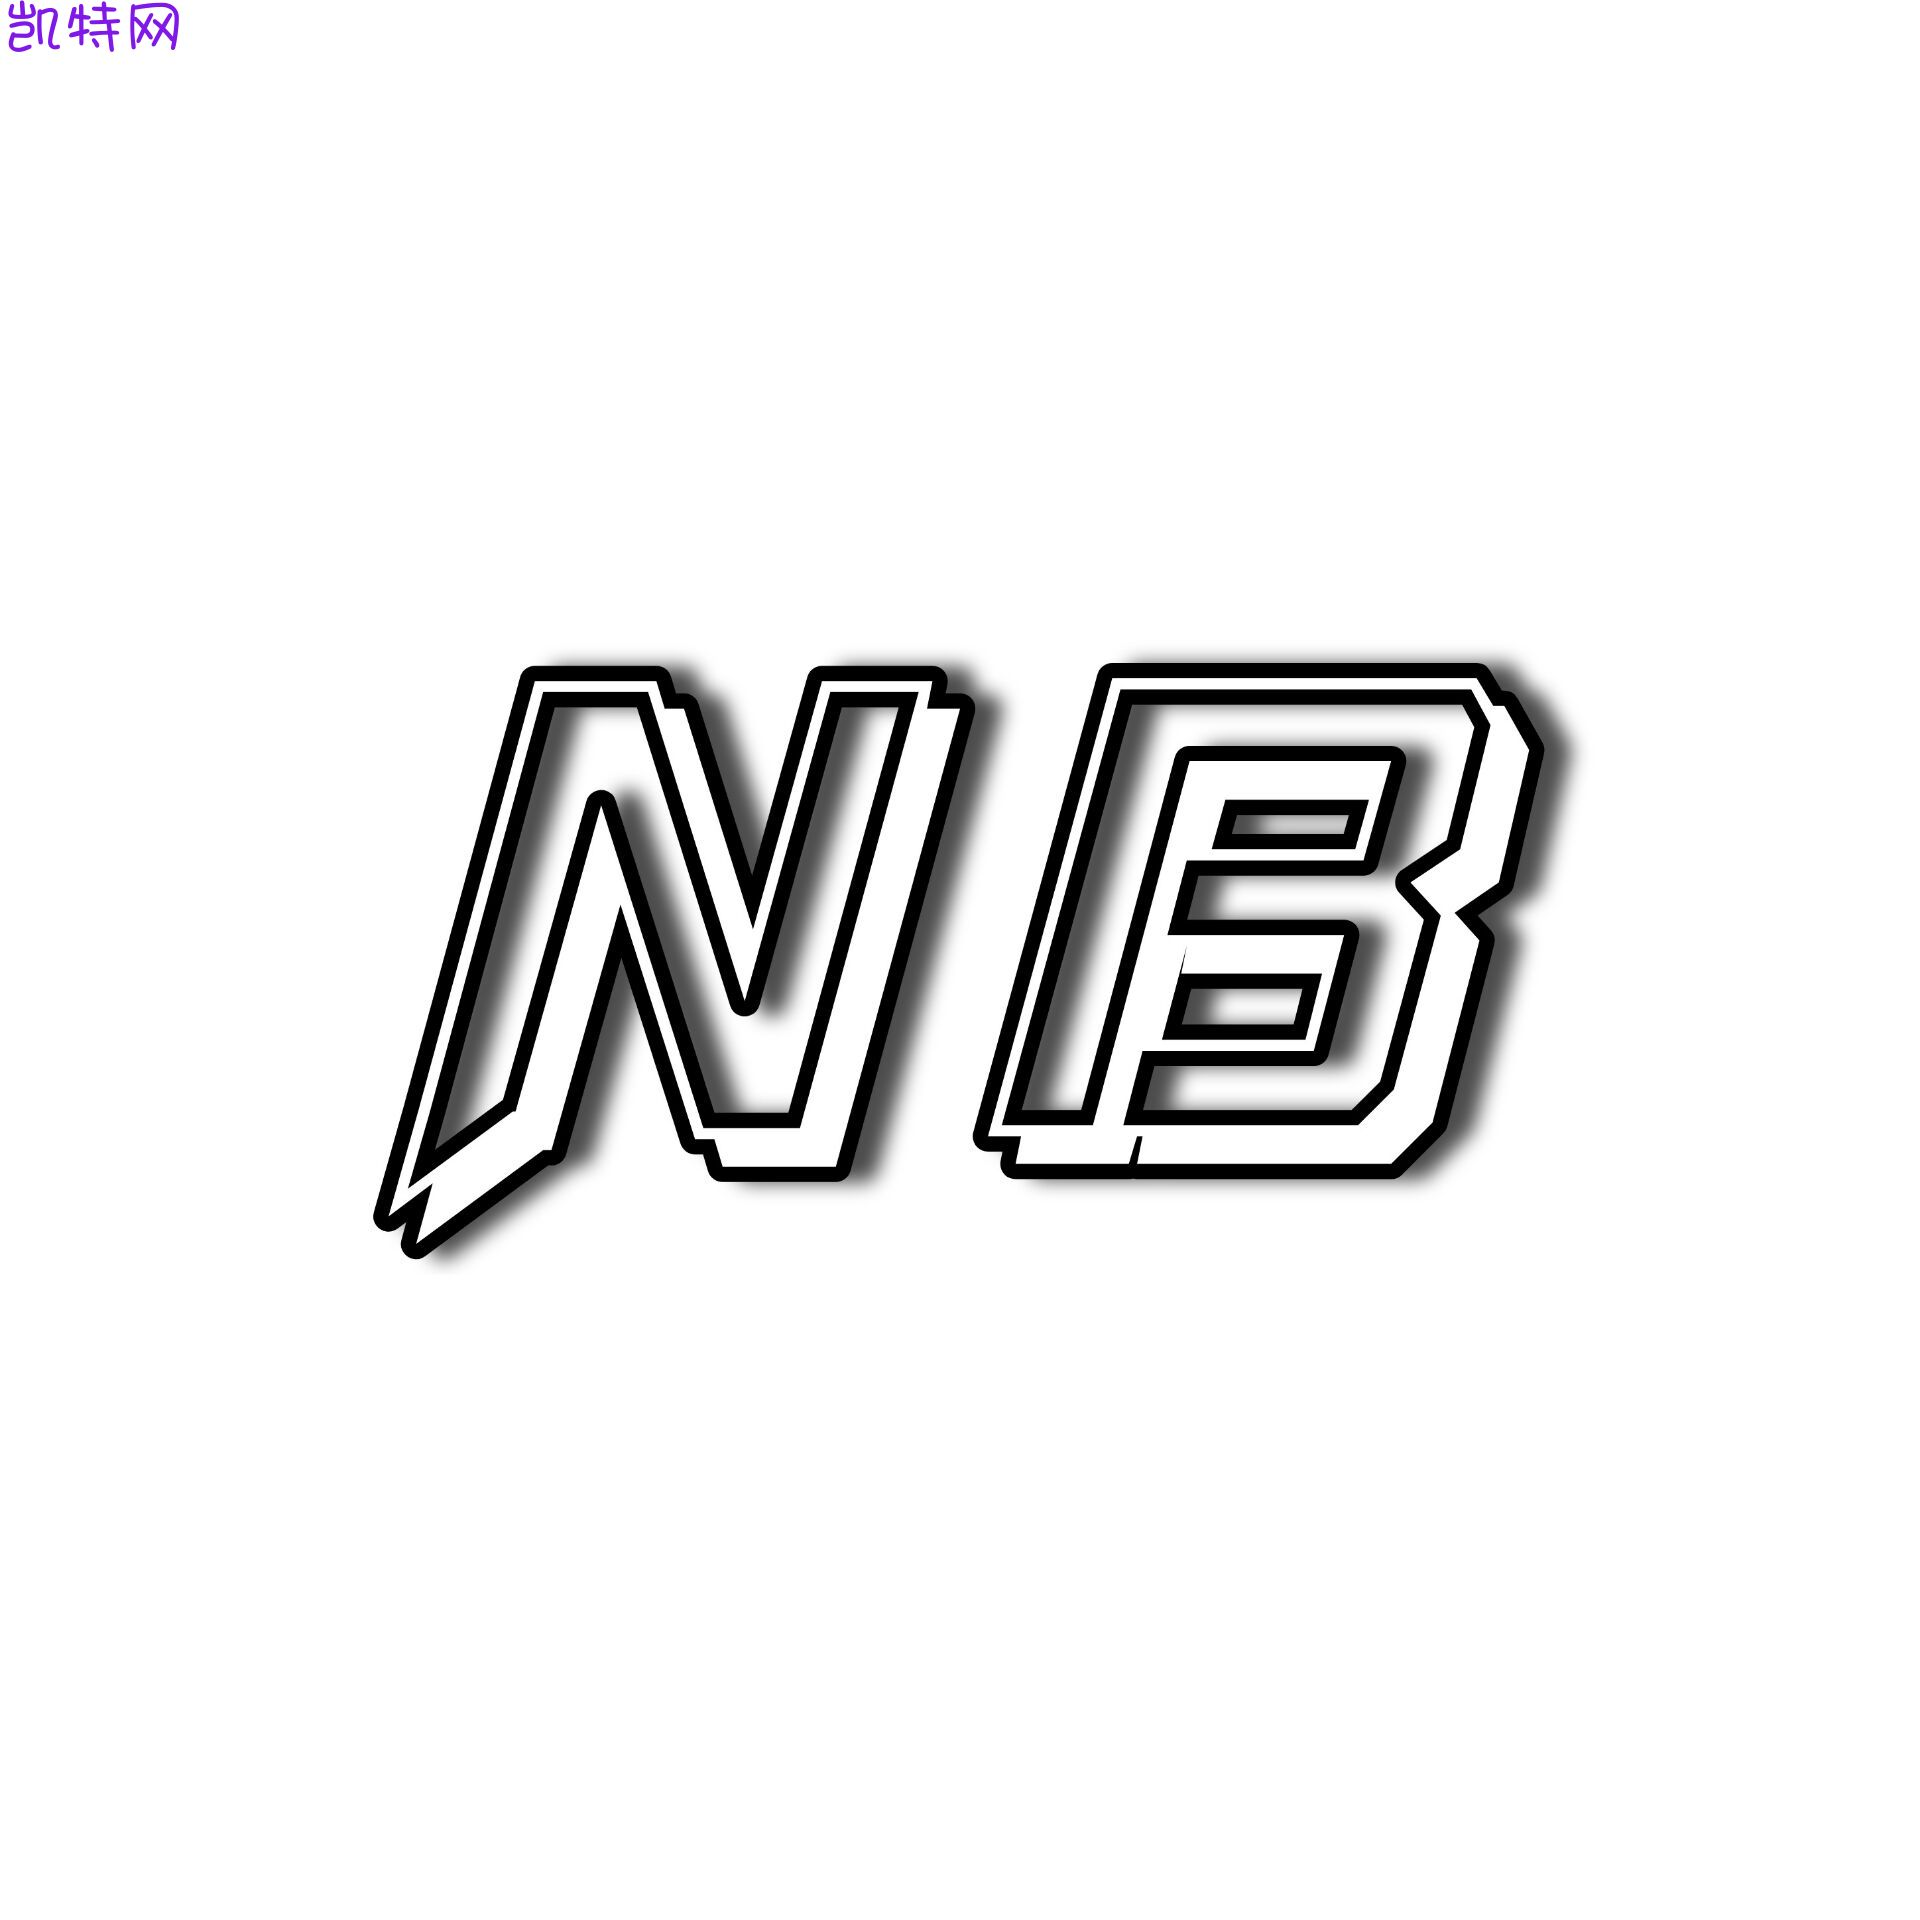 【NB】用手机limbo运行win7系统教程